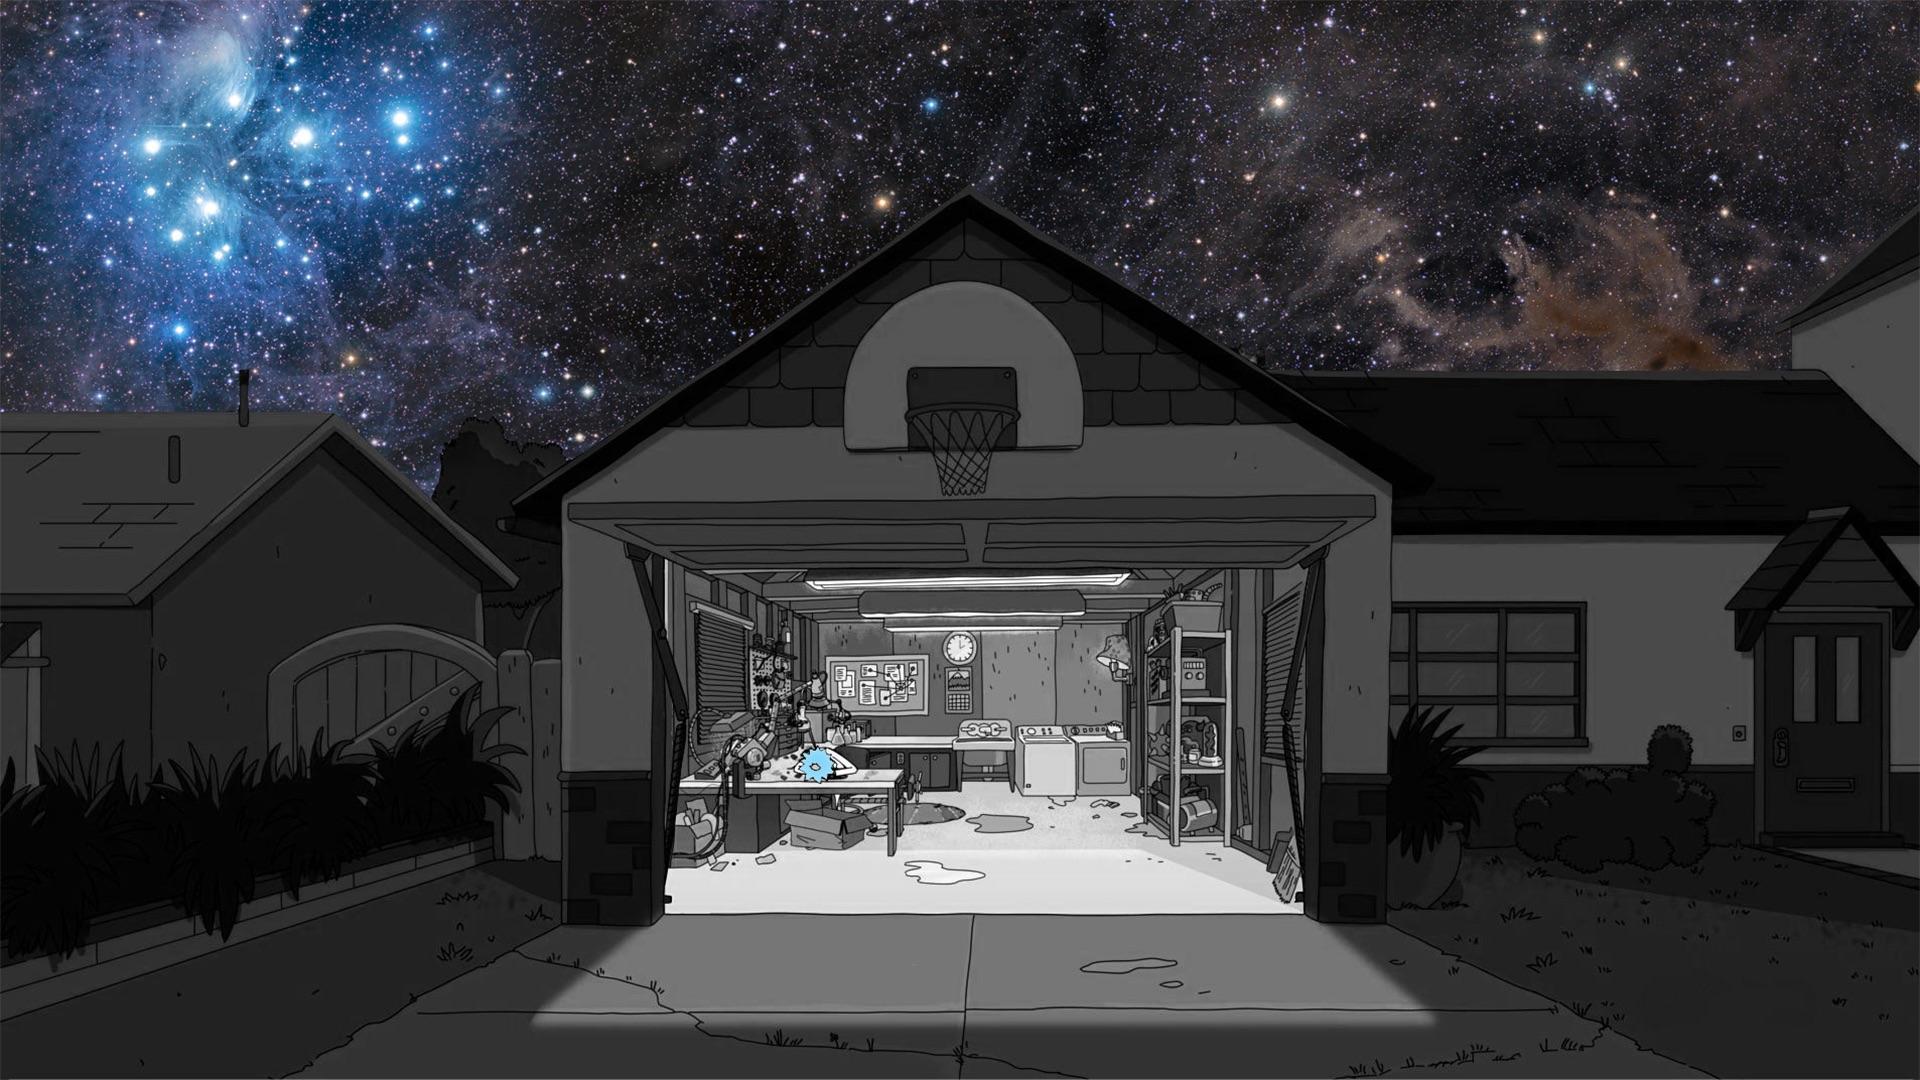 rick and morty garage hd wallpaper 63925